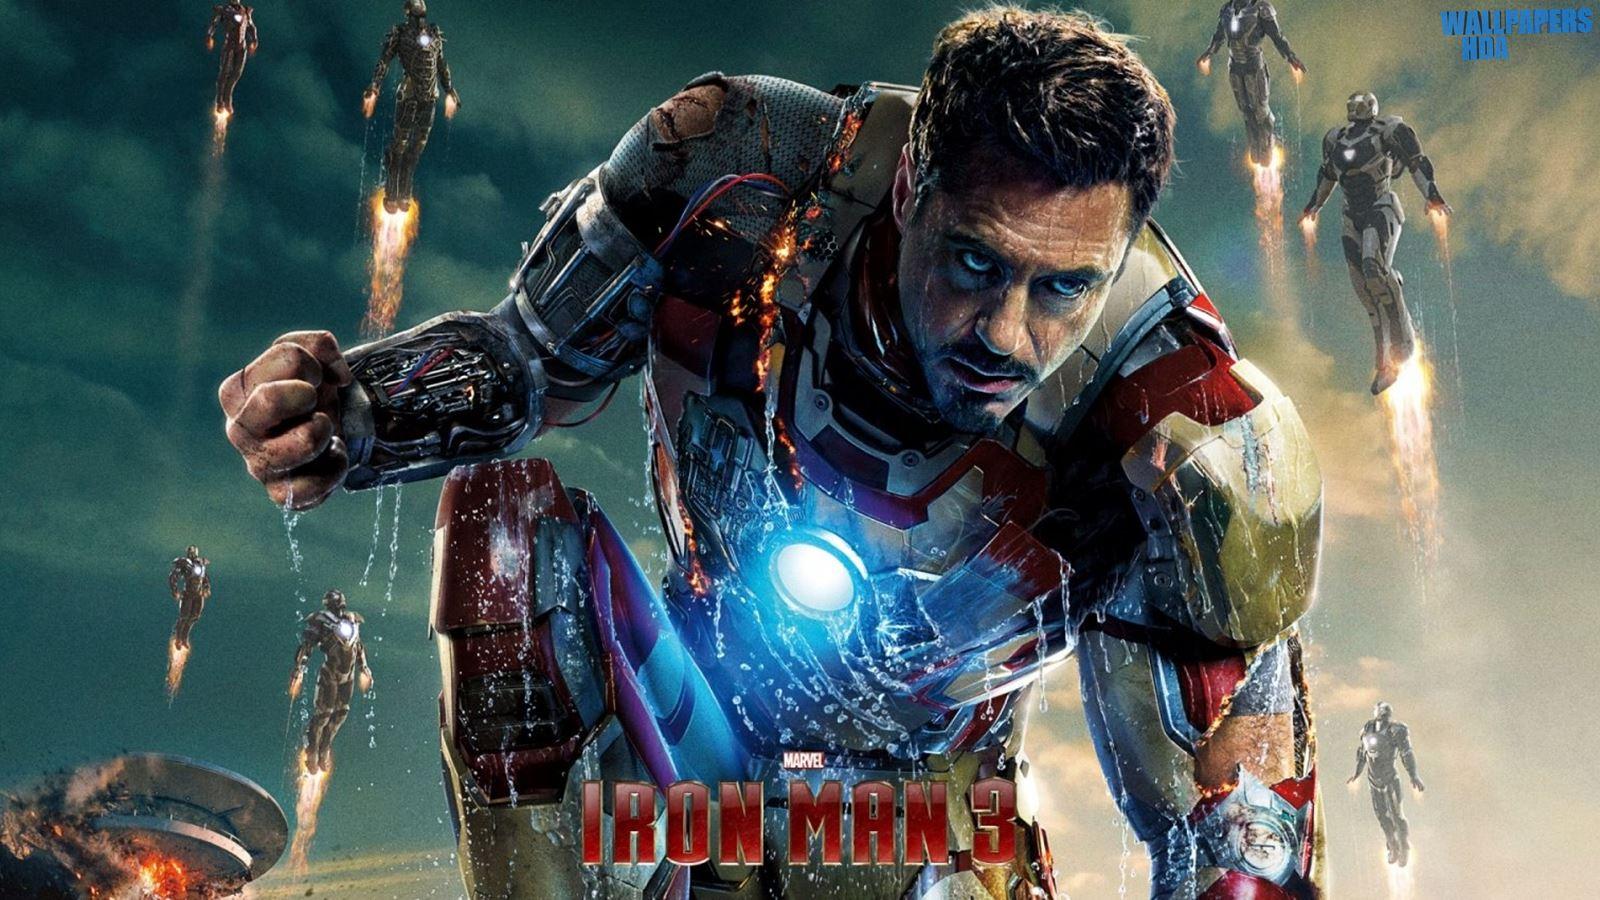 Iron man 20 wallpaper 1600x900